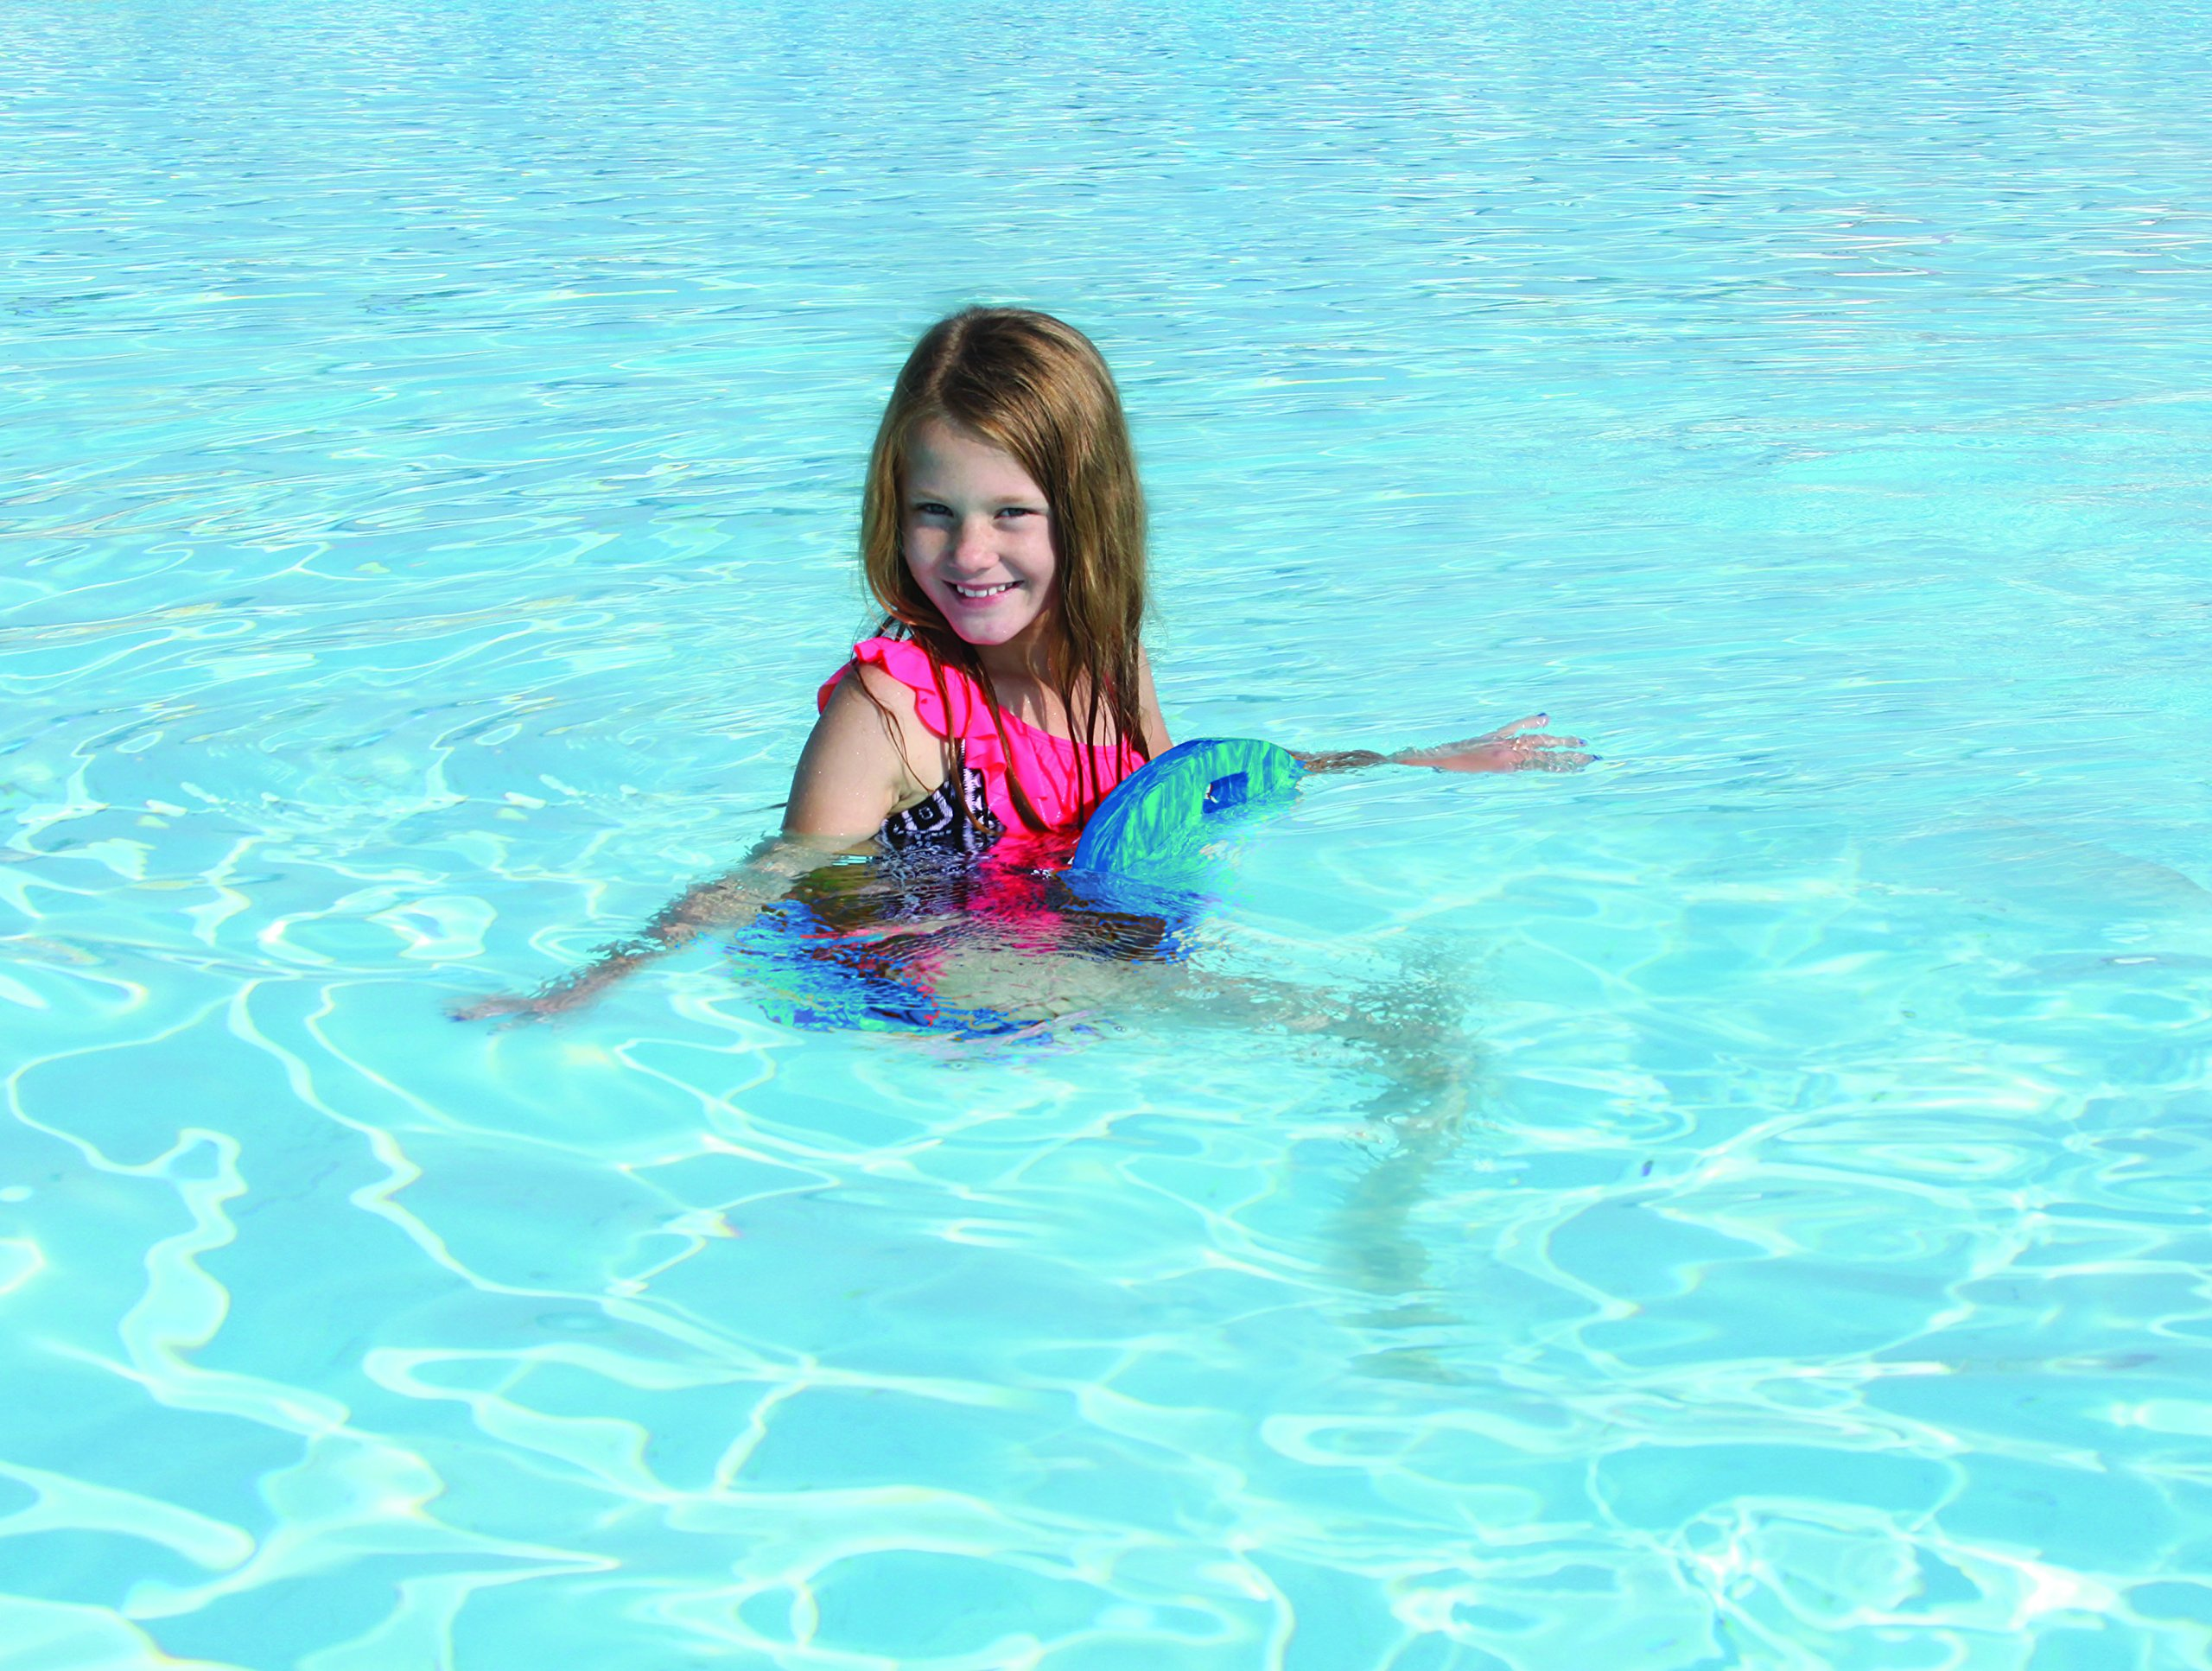 Airhead Sun Comfort Pool Saddle, Sapphire, 32'' x 16'' x 1.25'' by Airhead (Image #2)